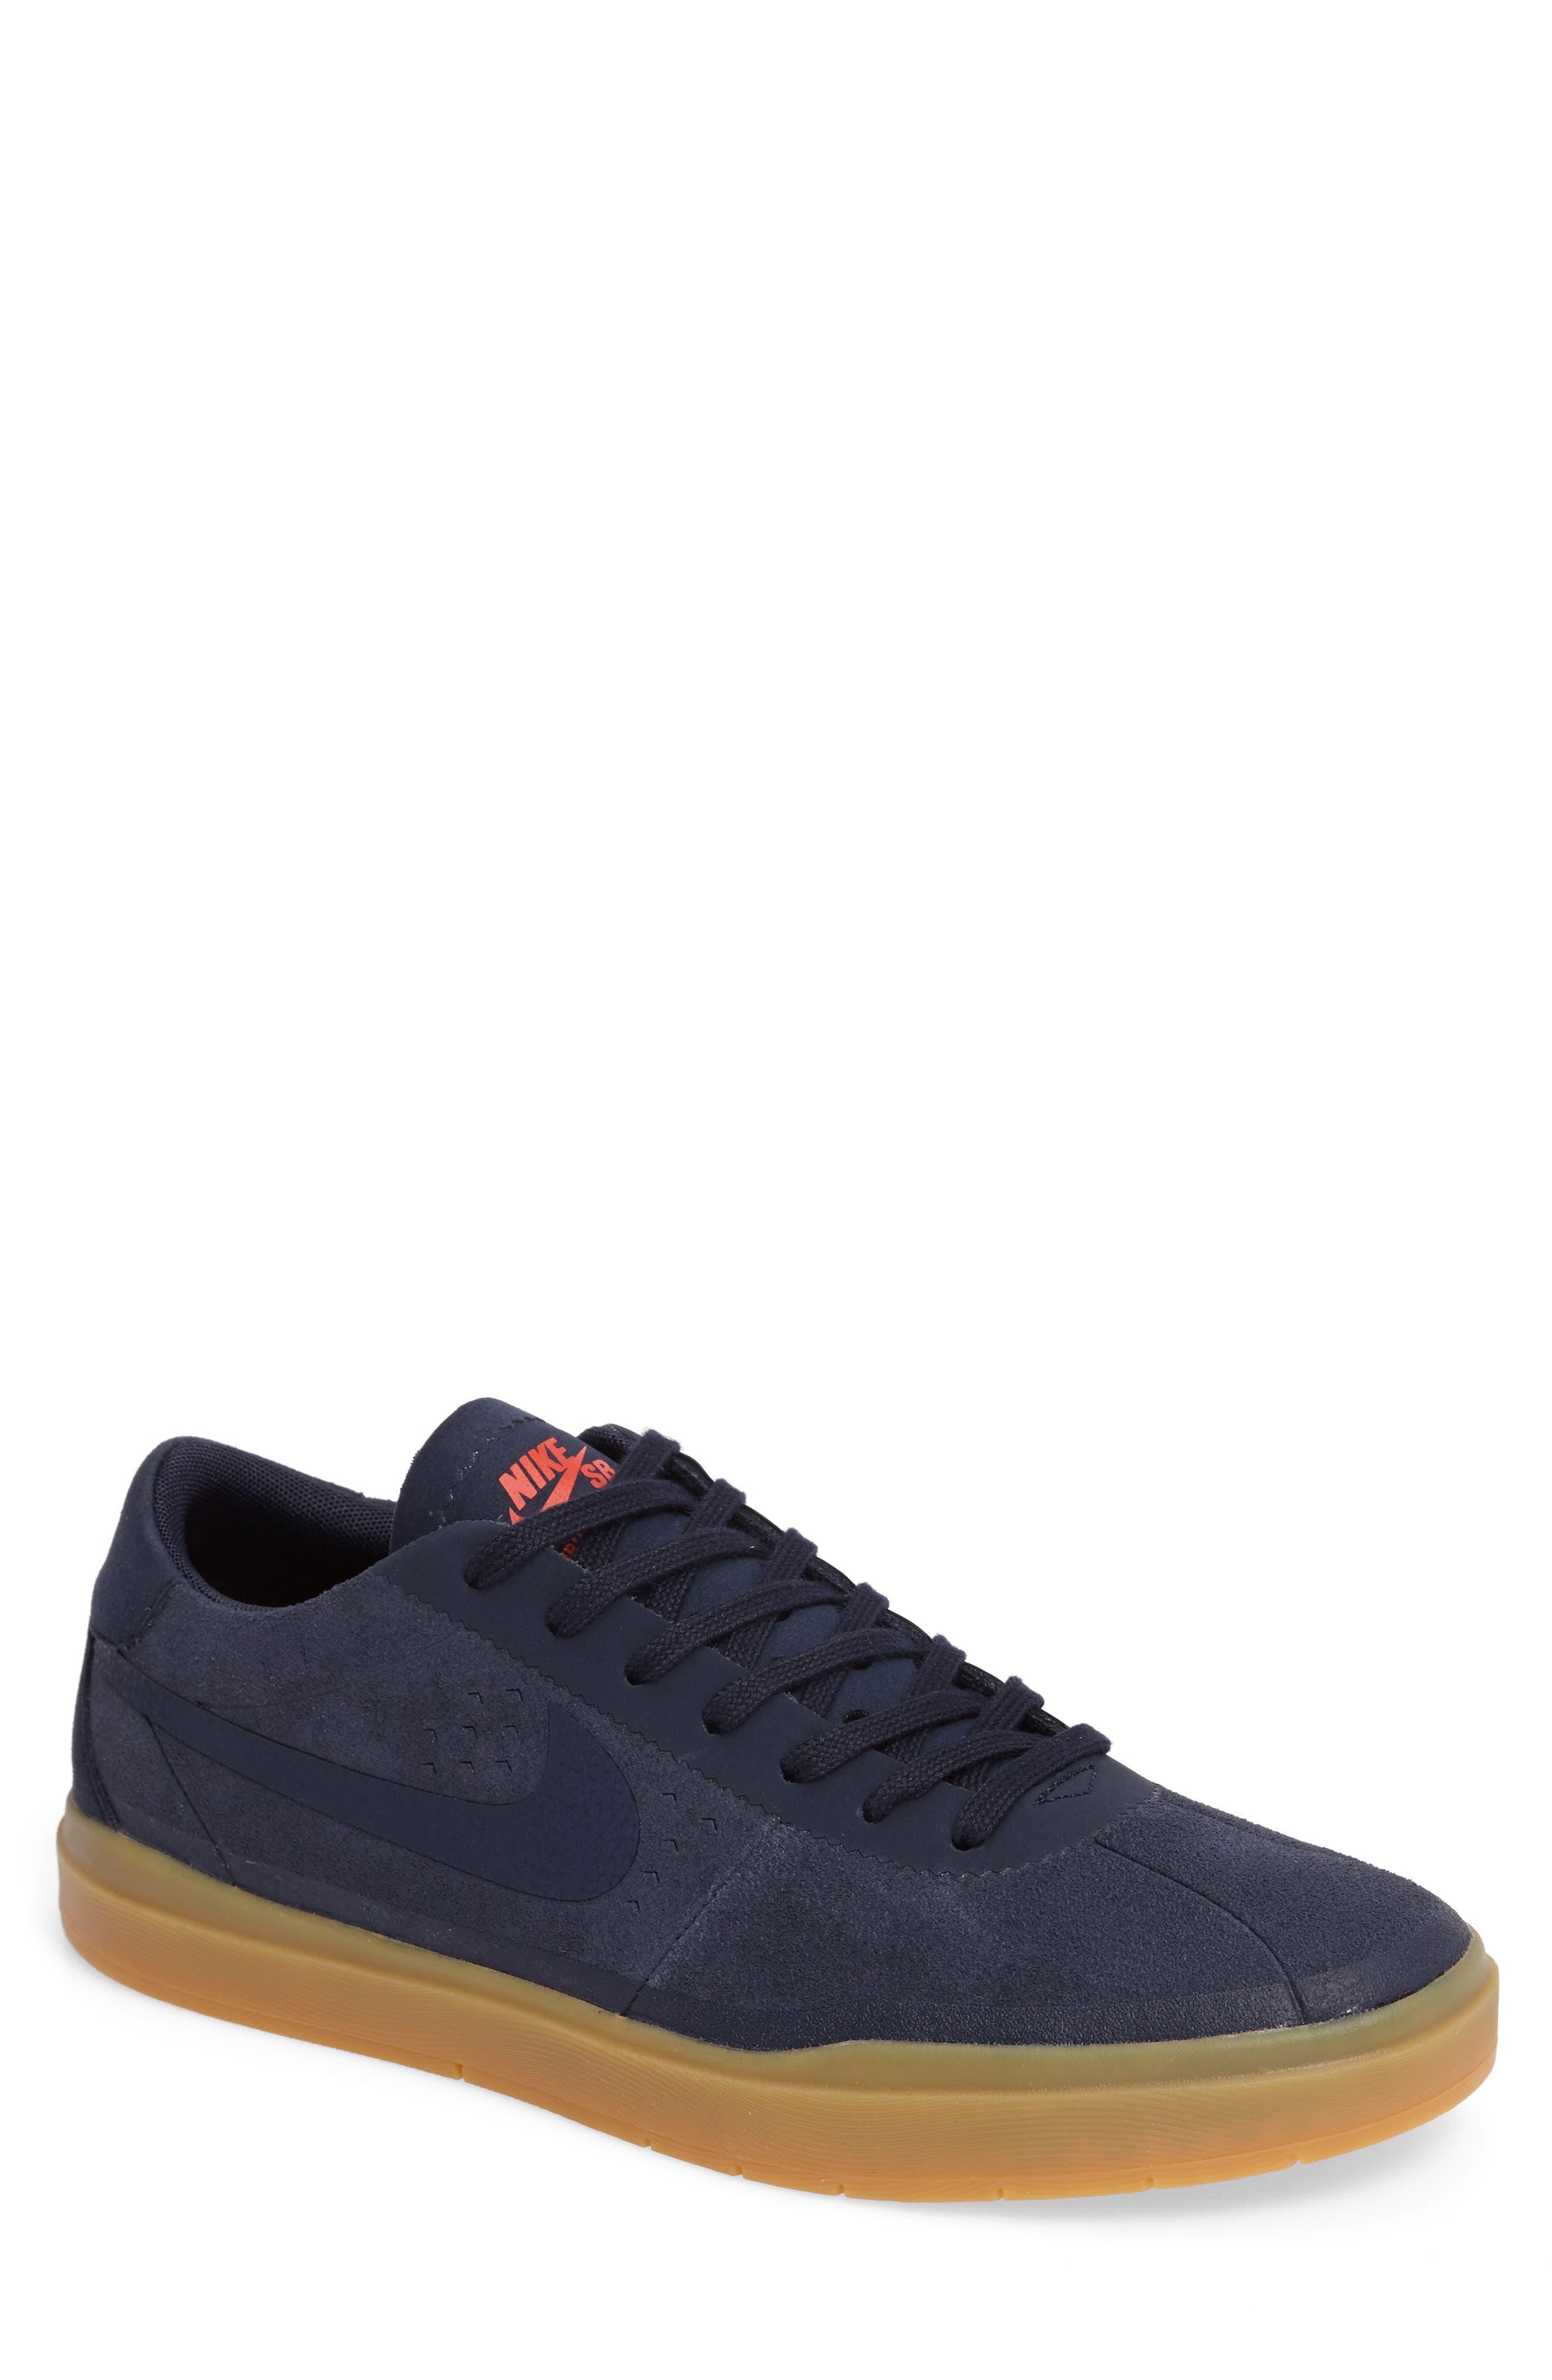 Bruin SB Hyperfeel Skate Shoe,                         Main,                         color, Obsidian/ Obsidian/ Gum